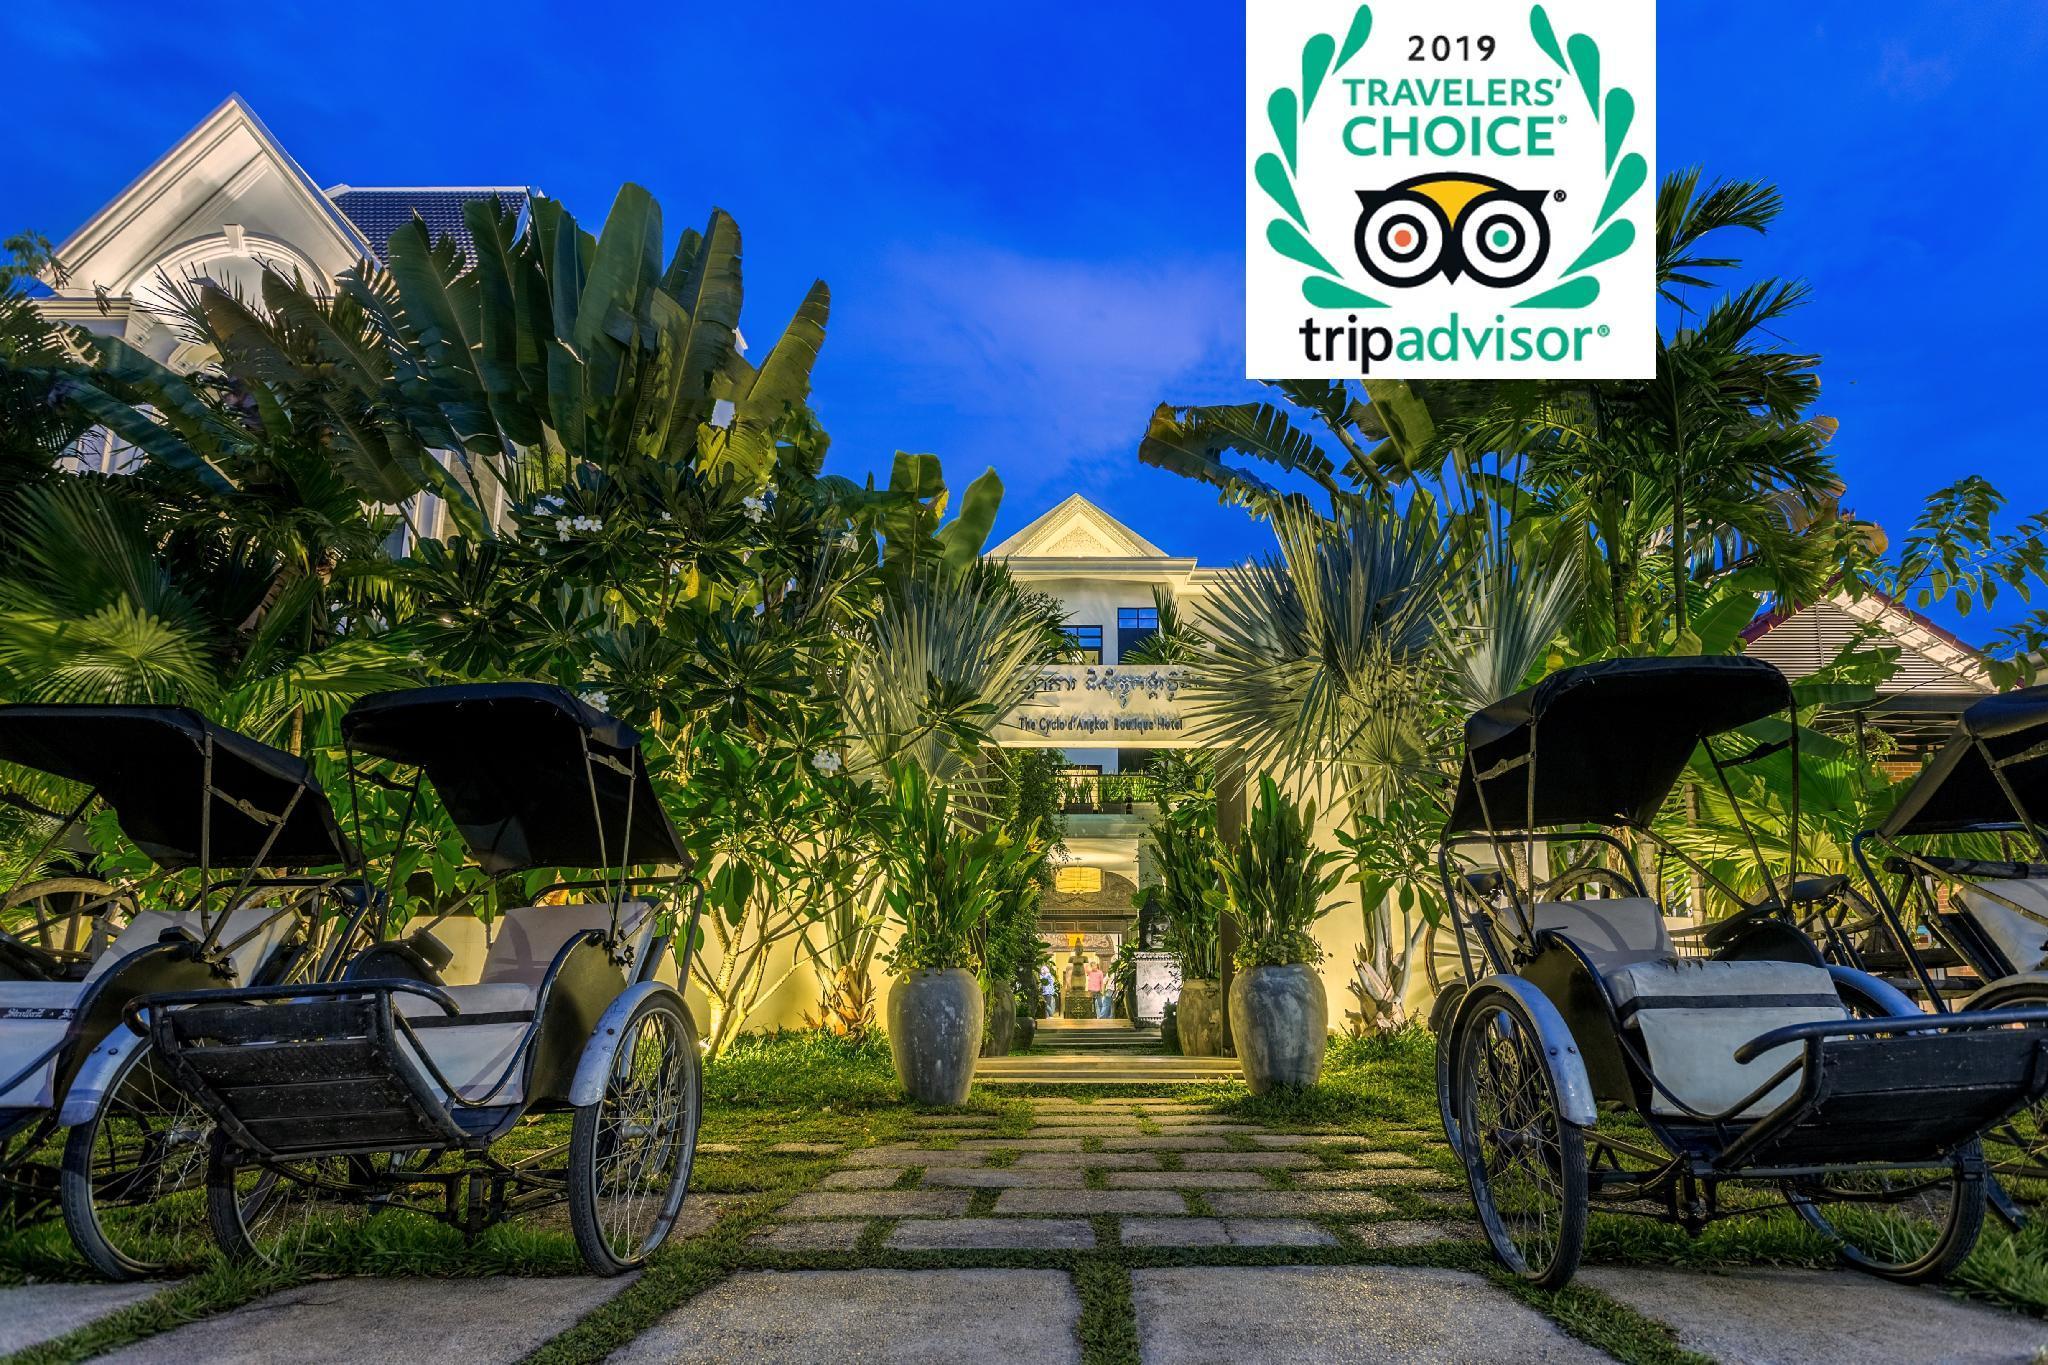 The Cyclo D'Angkor Boutique Hotel